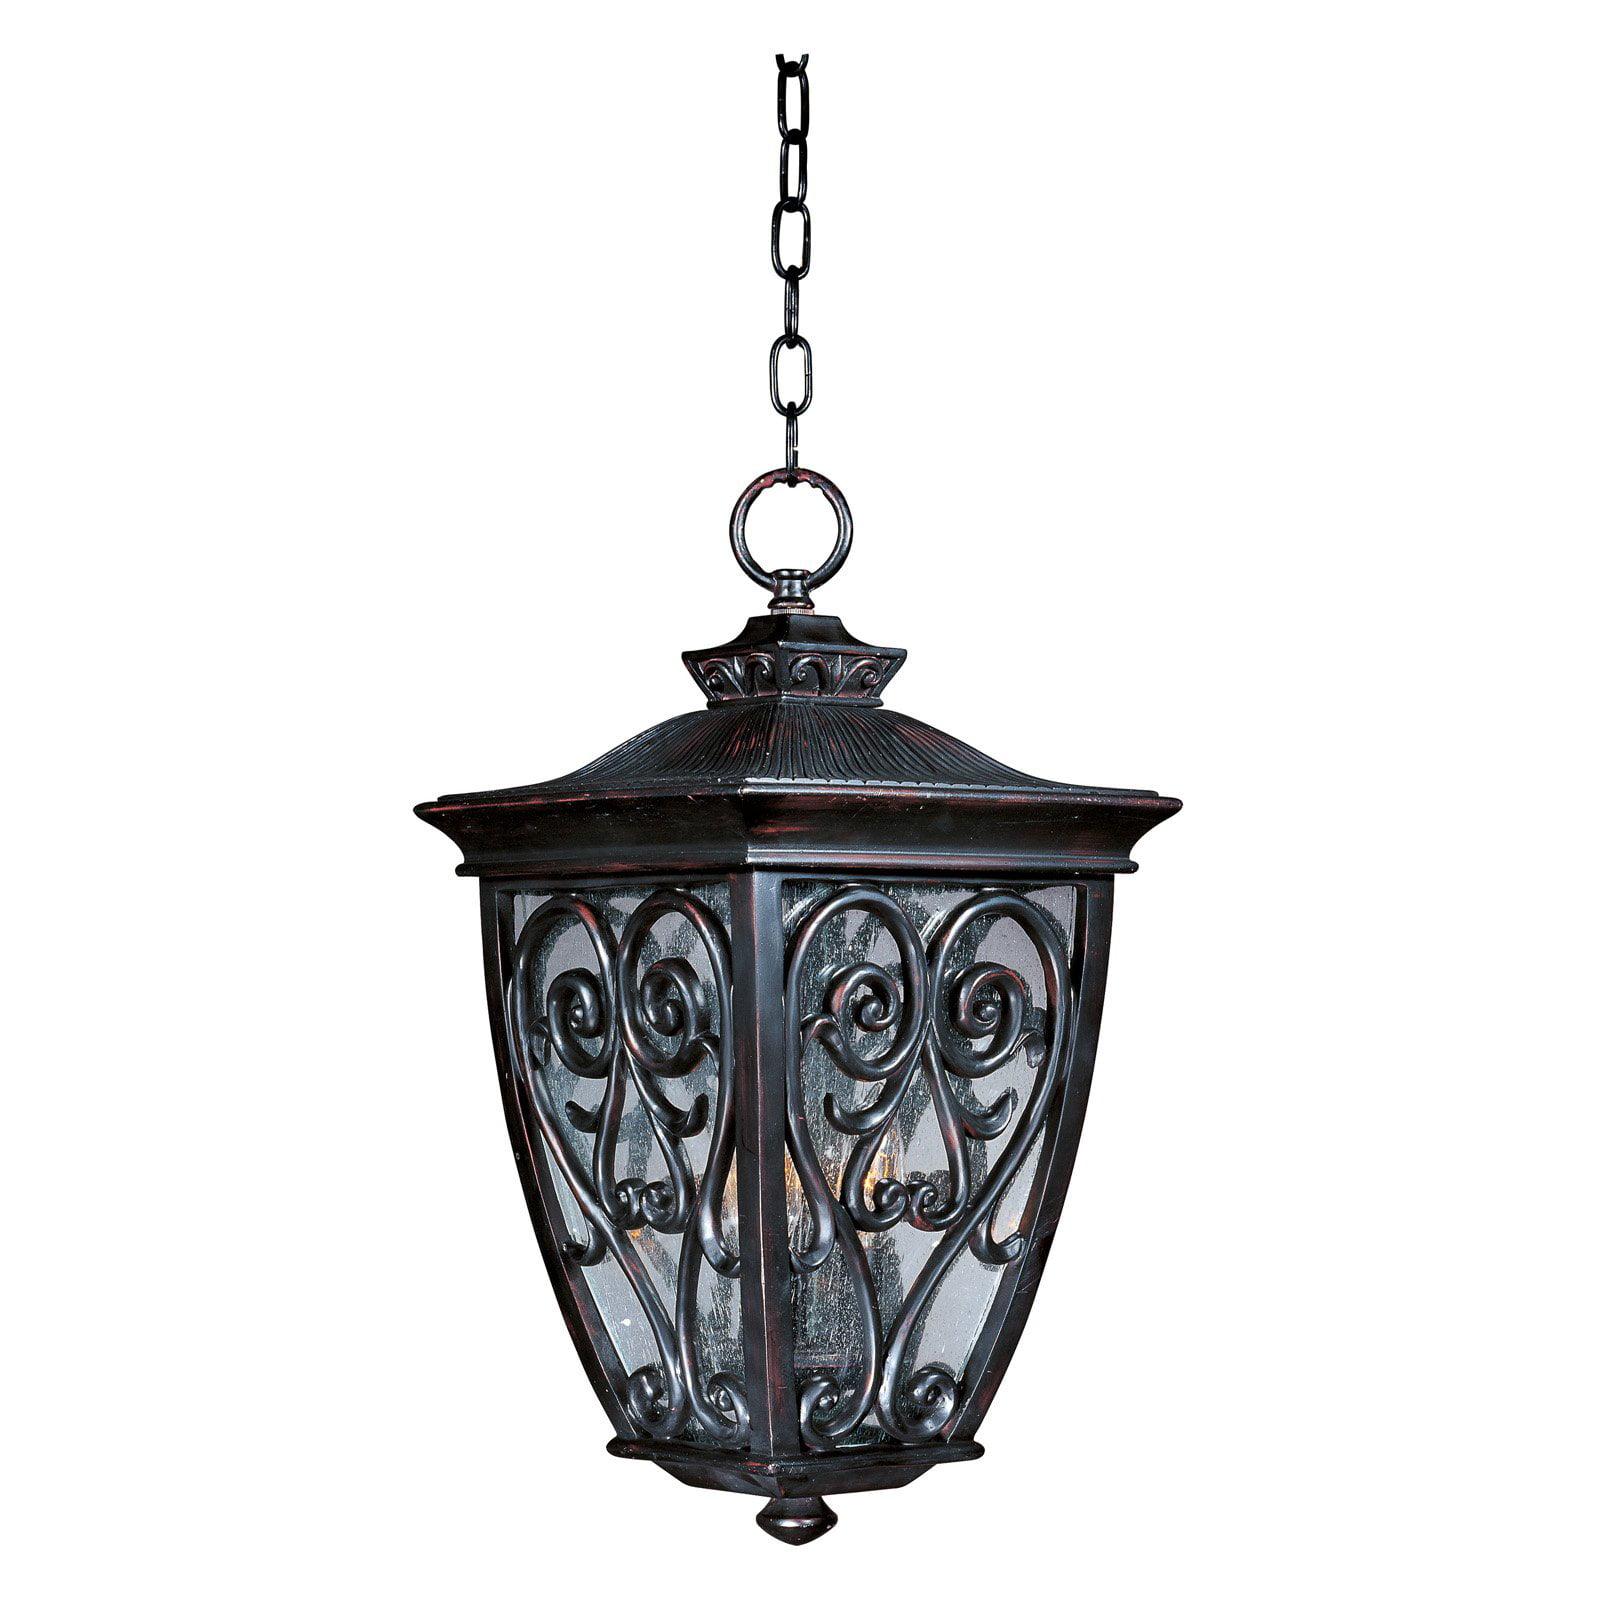 Maxim 40128CDOB Newbury VX Outdoor Hanging Lantern - 11.5W in. Oriental Bronze